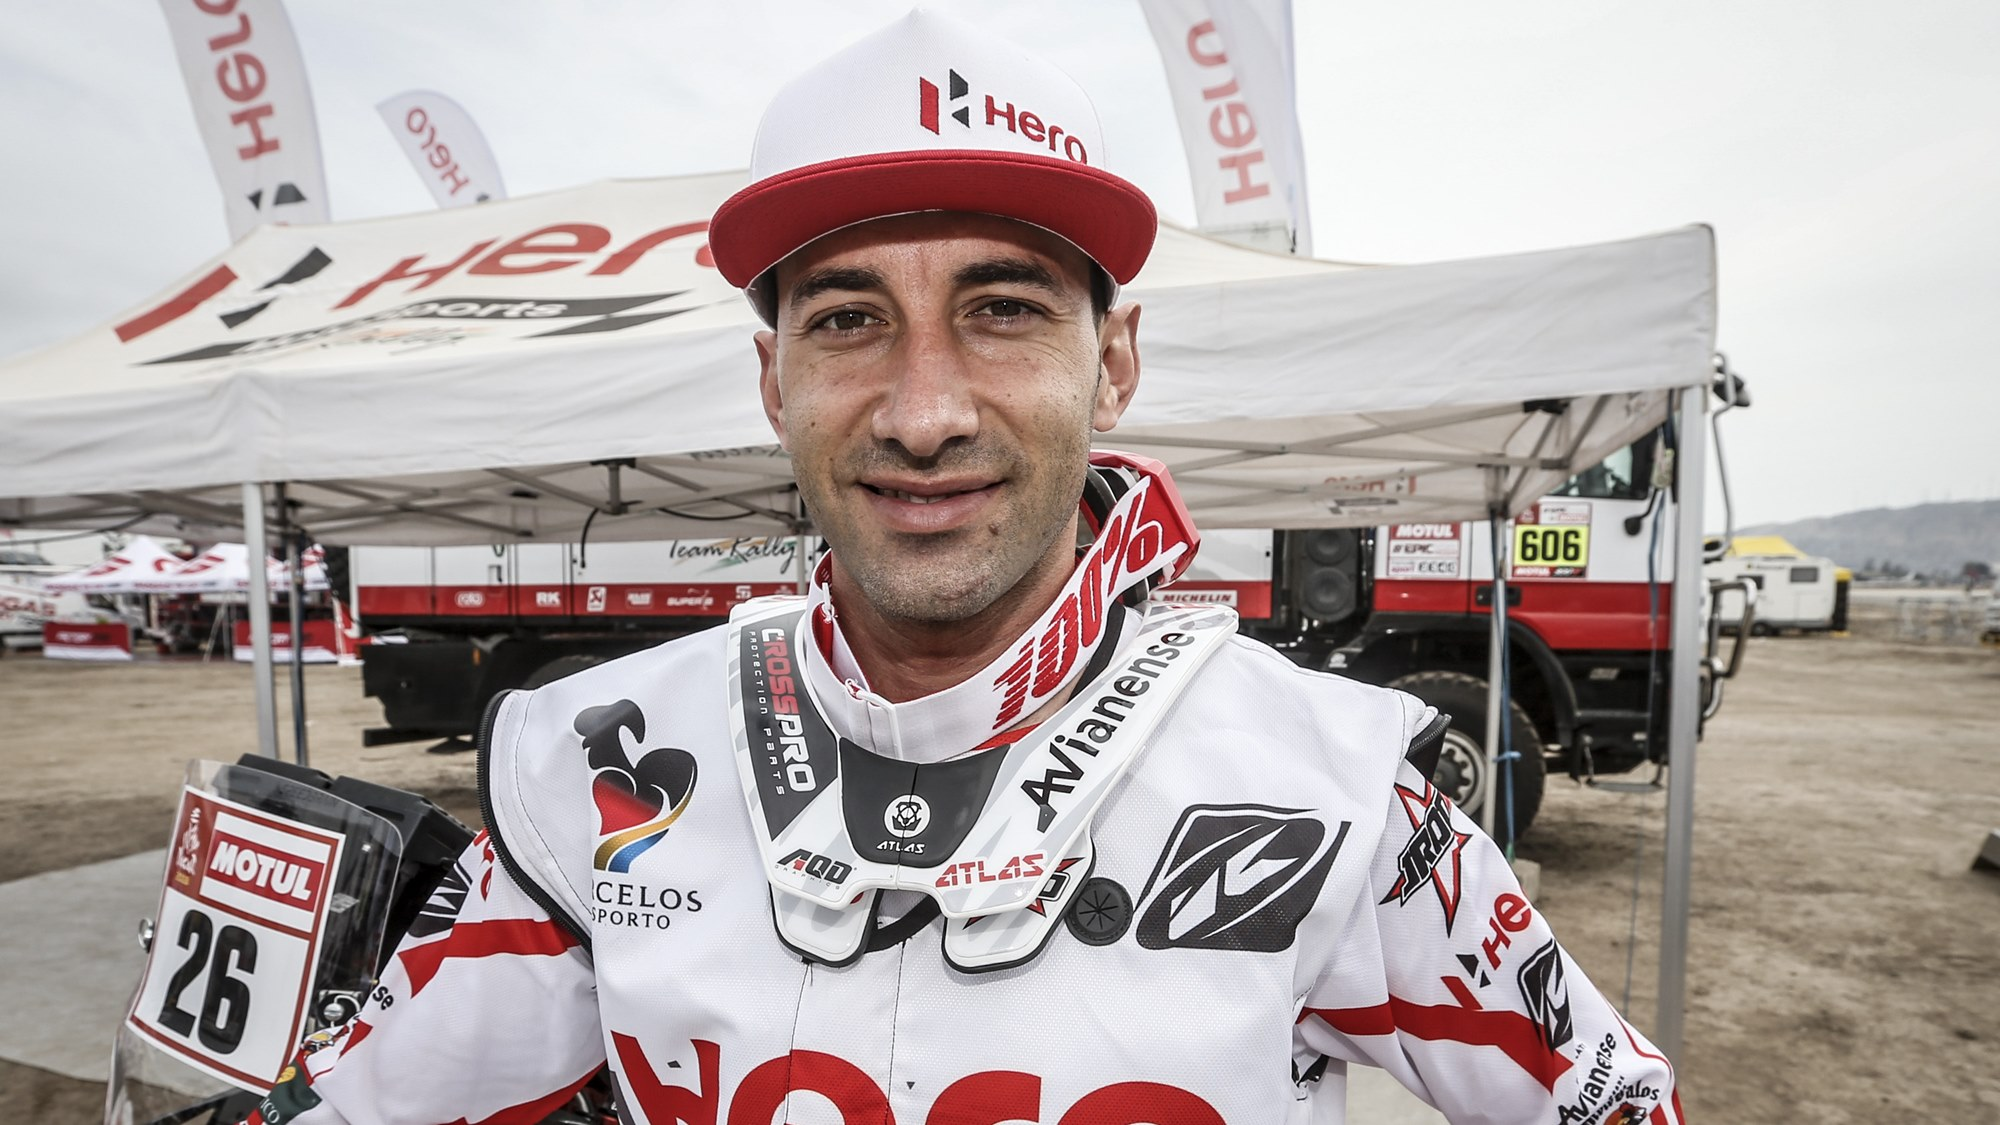 Joaquim Rodrigues, Rider, Hero MotoSports Team Rally